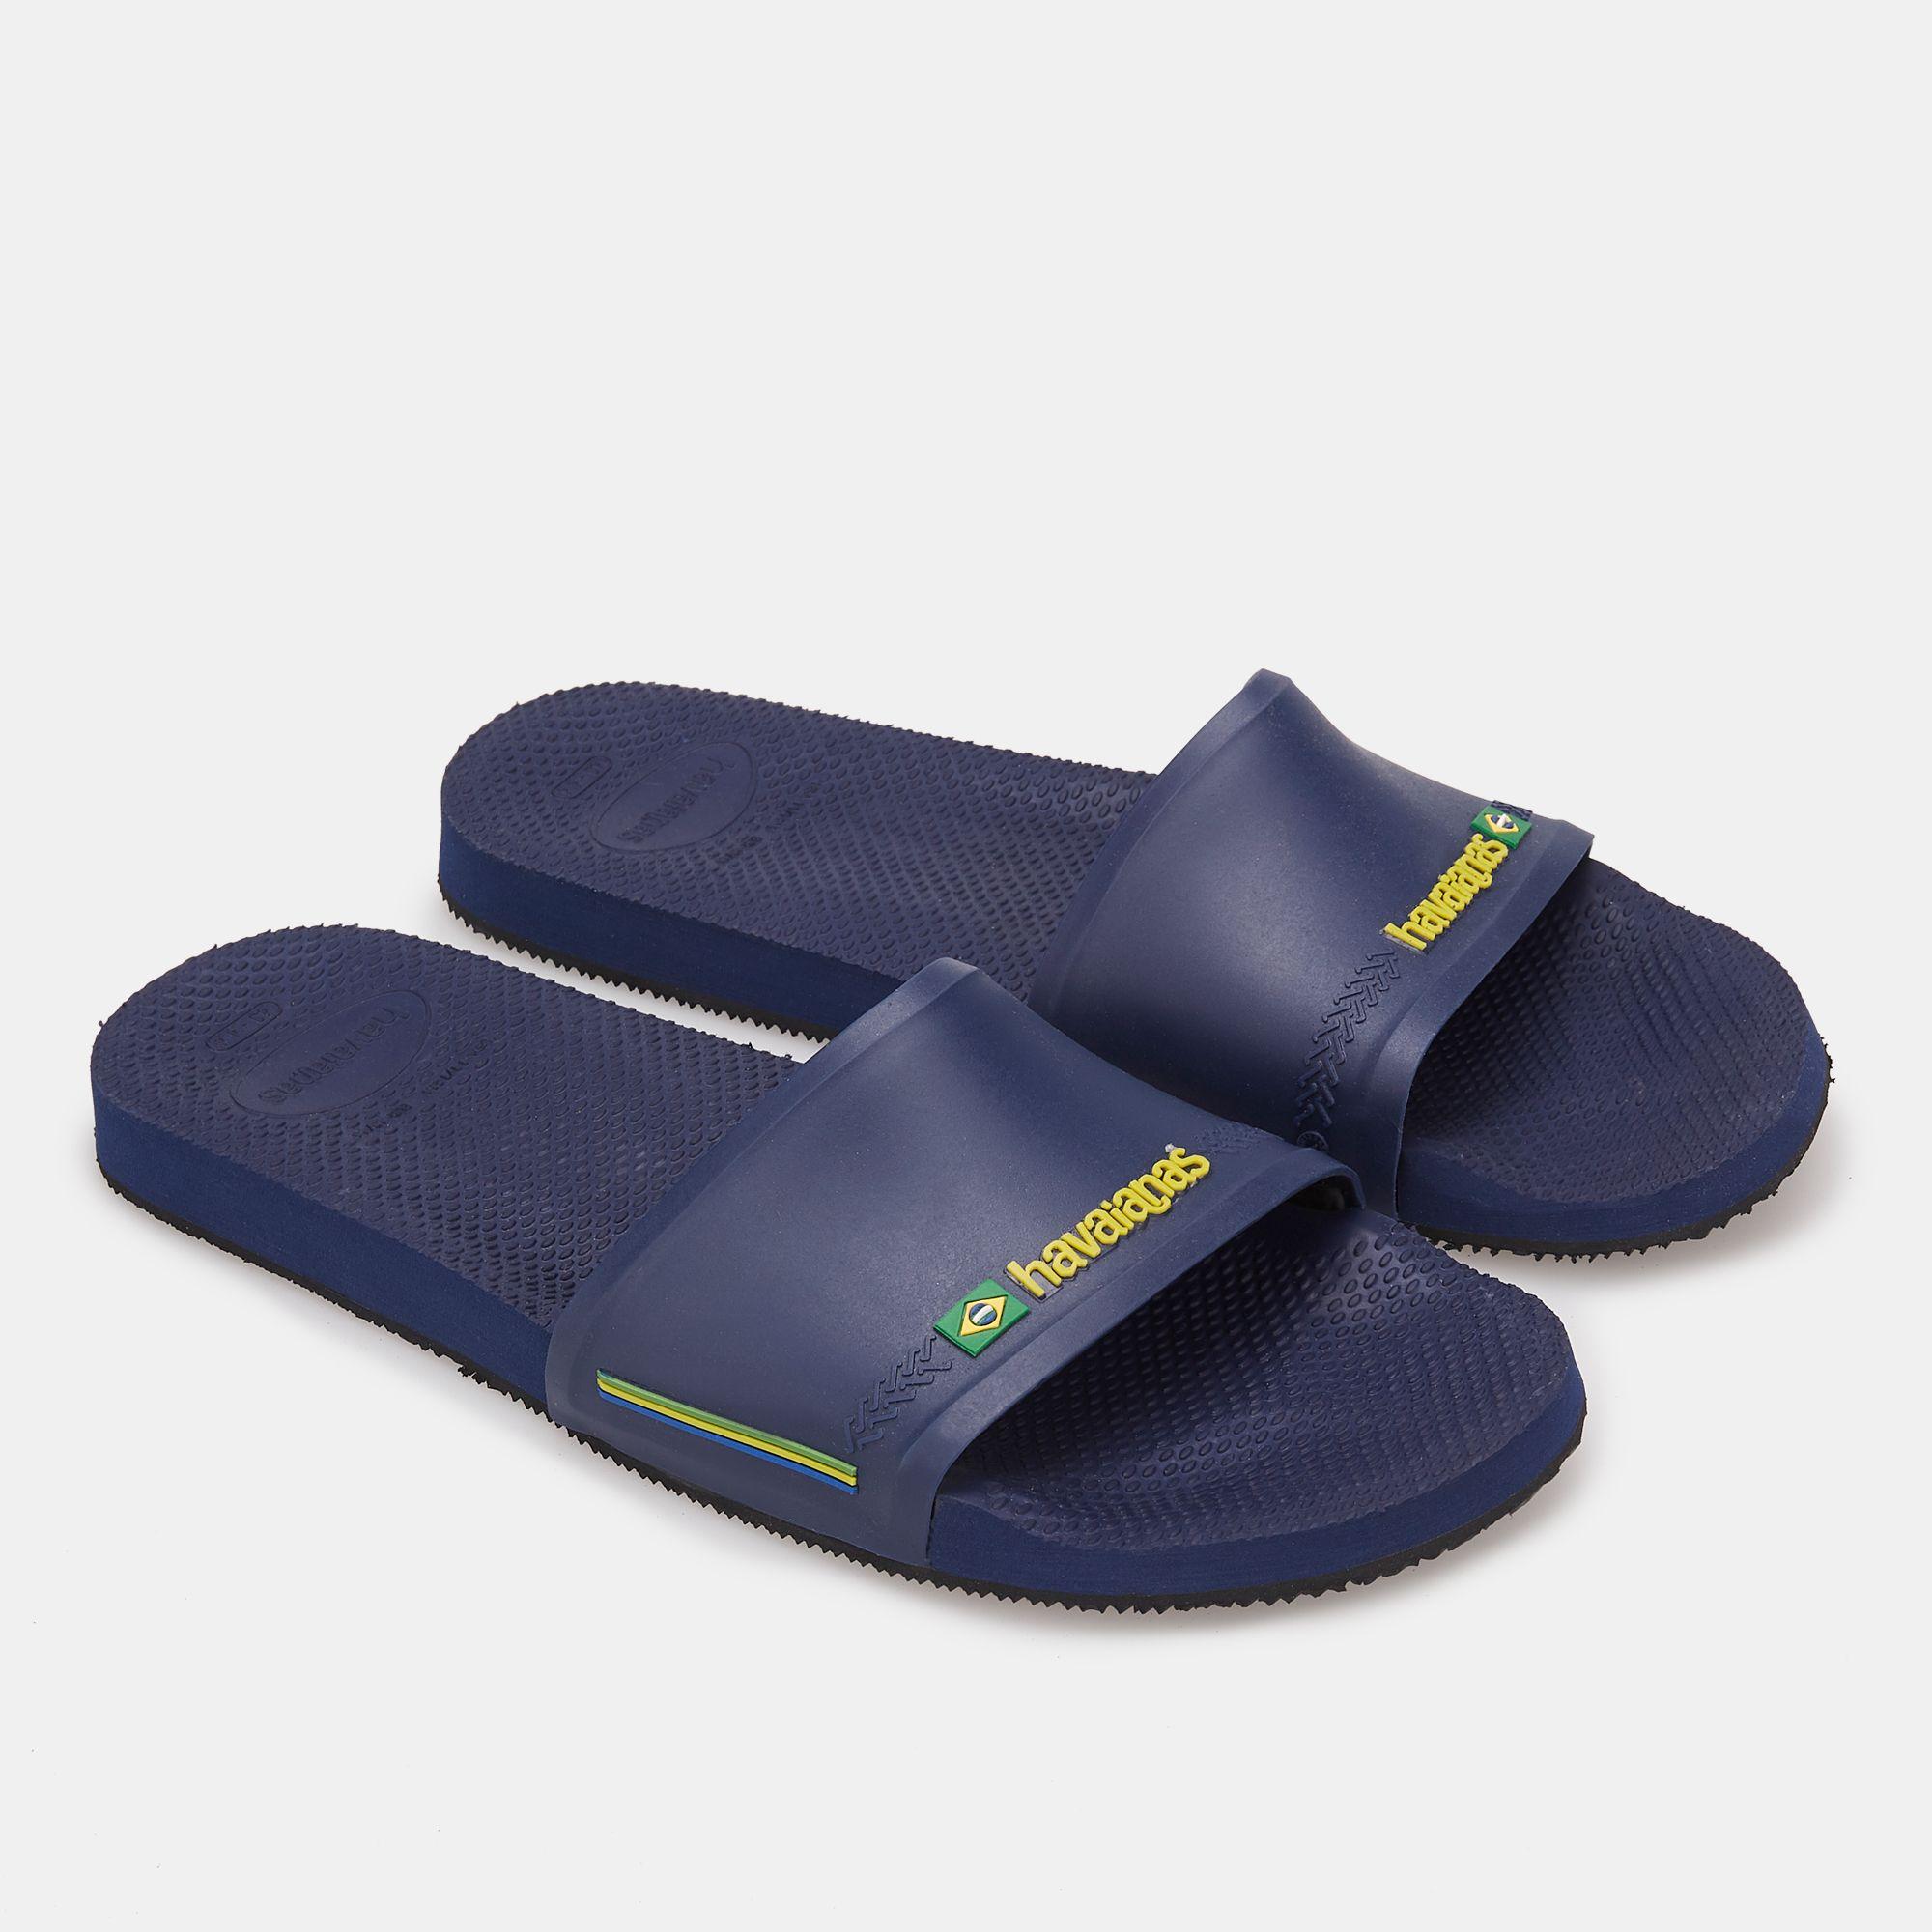 e587b1786e6a9c Havaianas Men s Brasil Slide